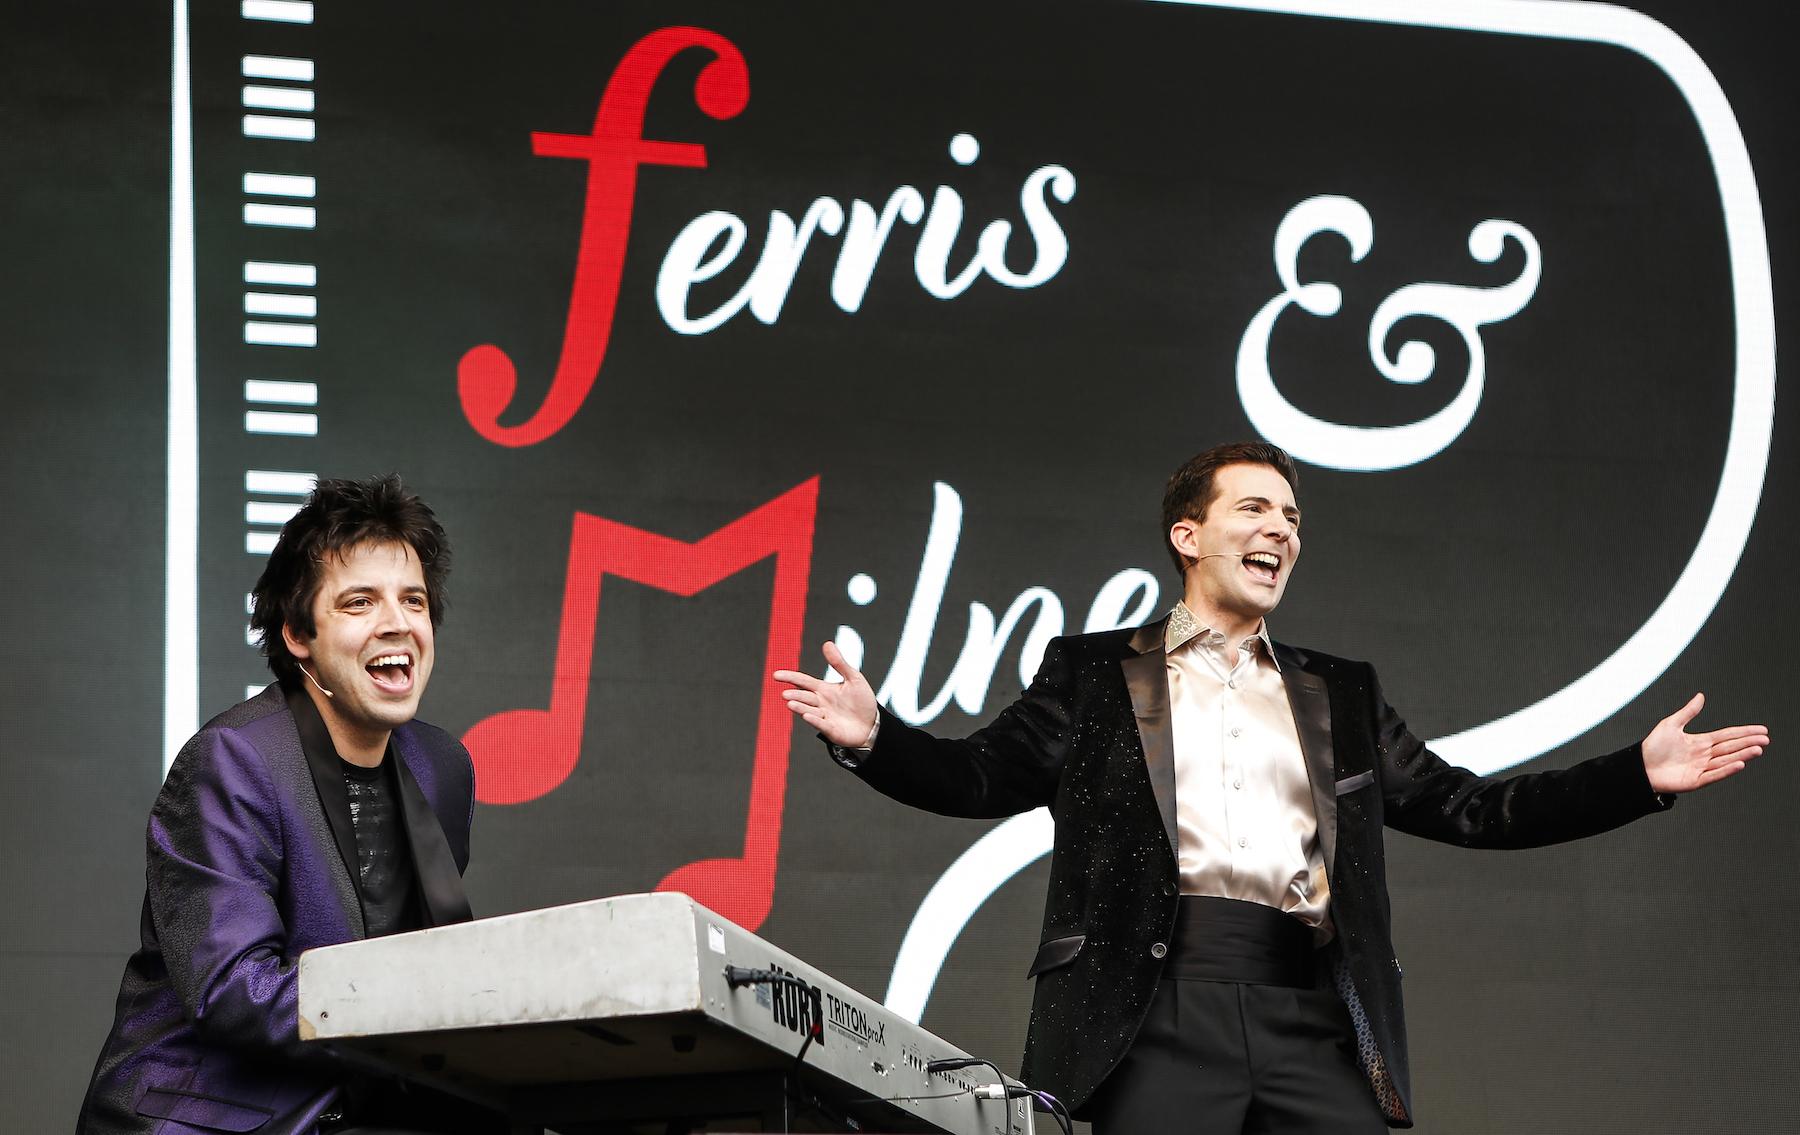 Ferris & Milnes:The British Are Coming! The British Are Coming!